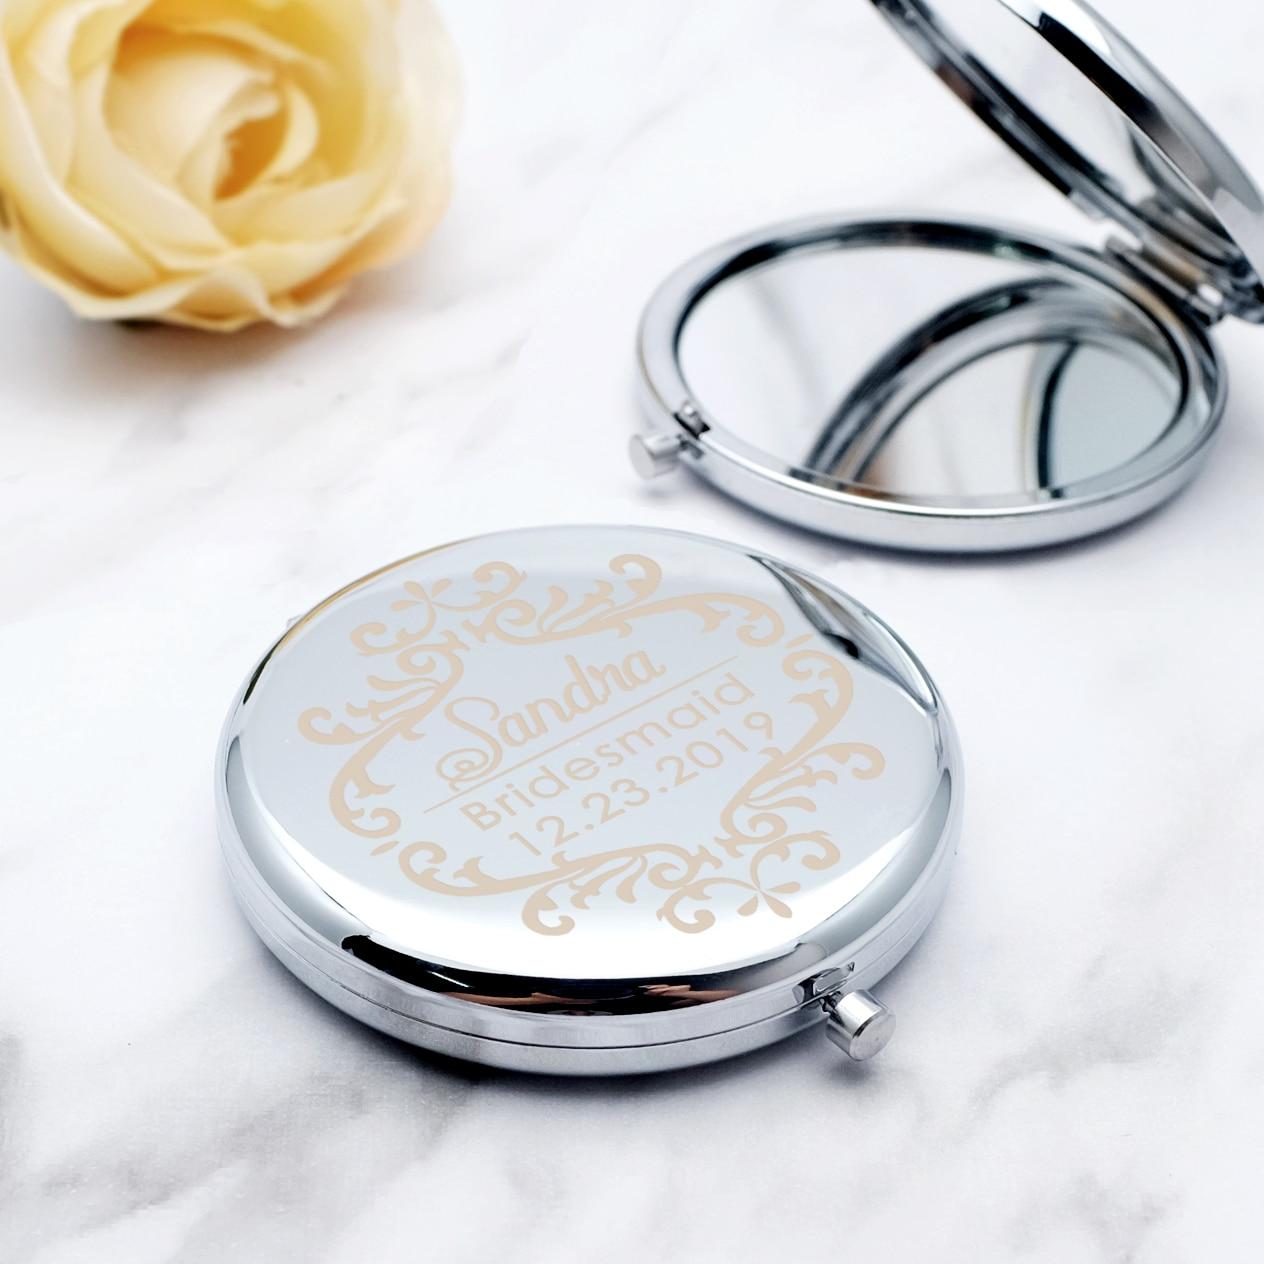 Personalised Compact Mirror Bridesmaid Gift Pocket Mirror Makeup Handbag Mirror Bridal Party Gift Wedding Favor